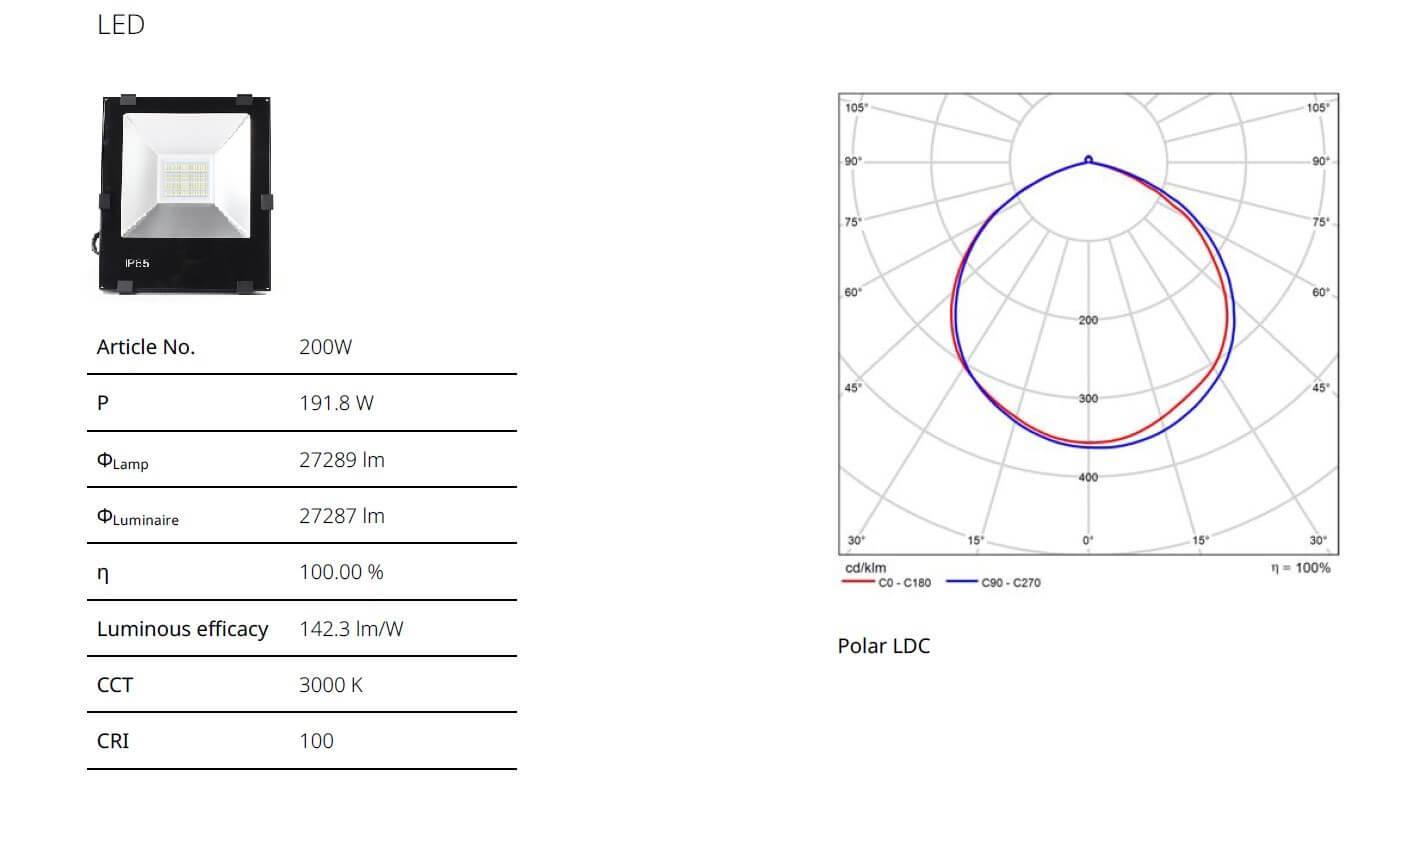 Datasheet-Dialux-200w-Flood-LED-Light